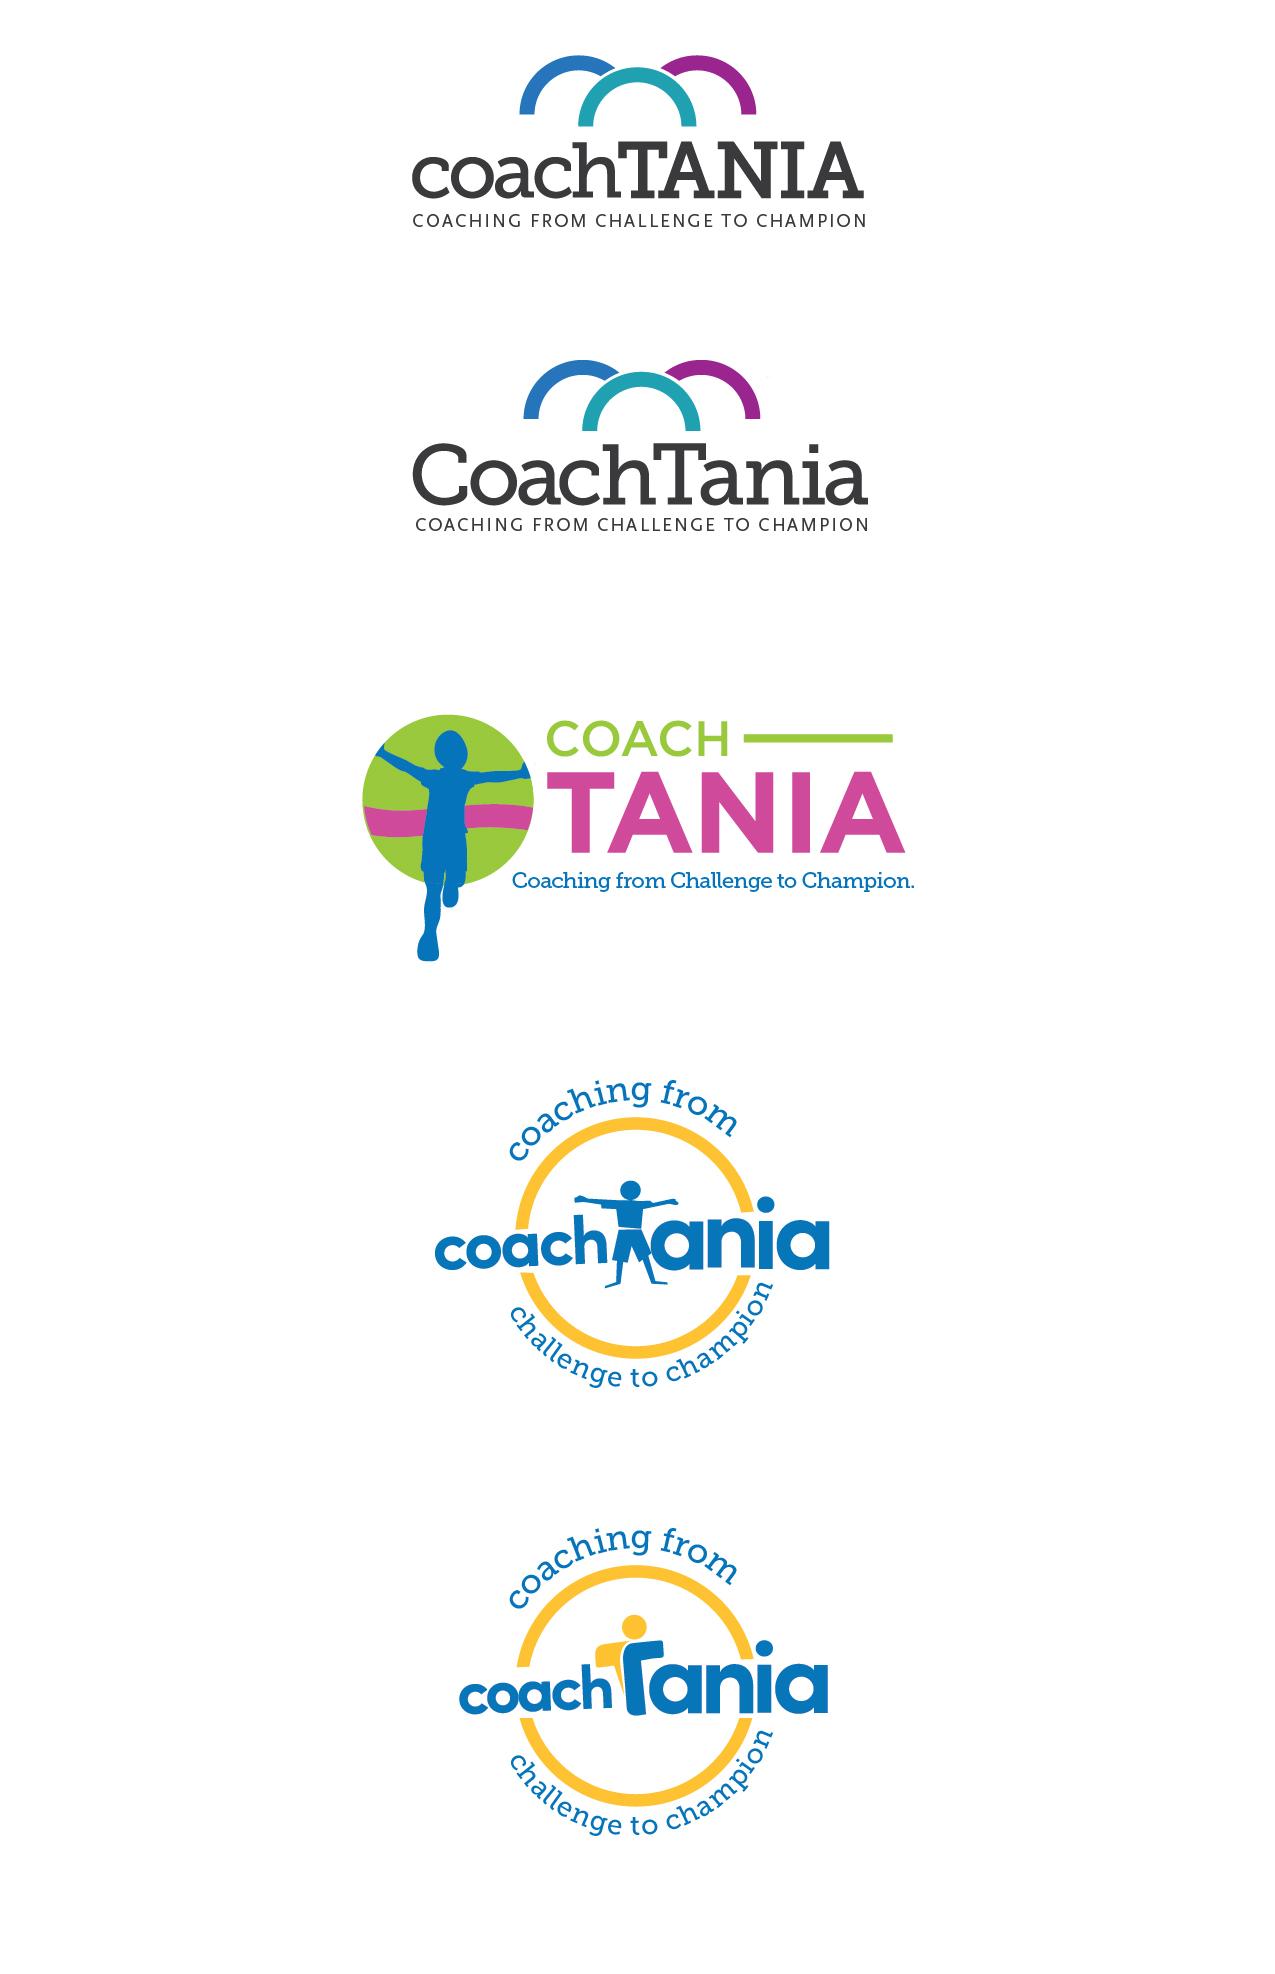 coach-tania-logos-v2-01.jpg